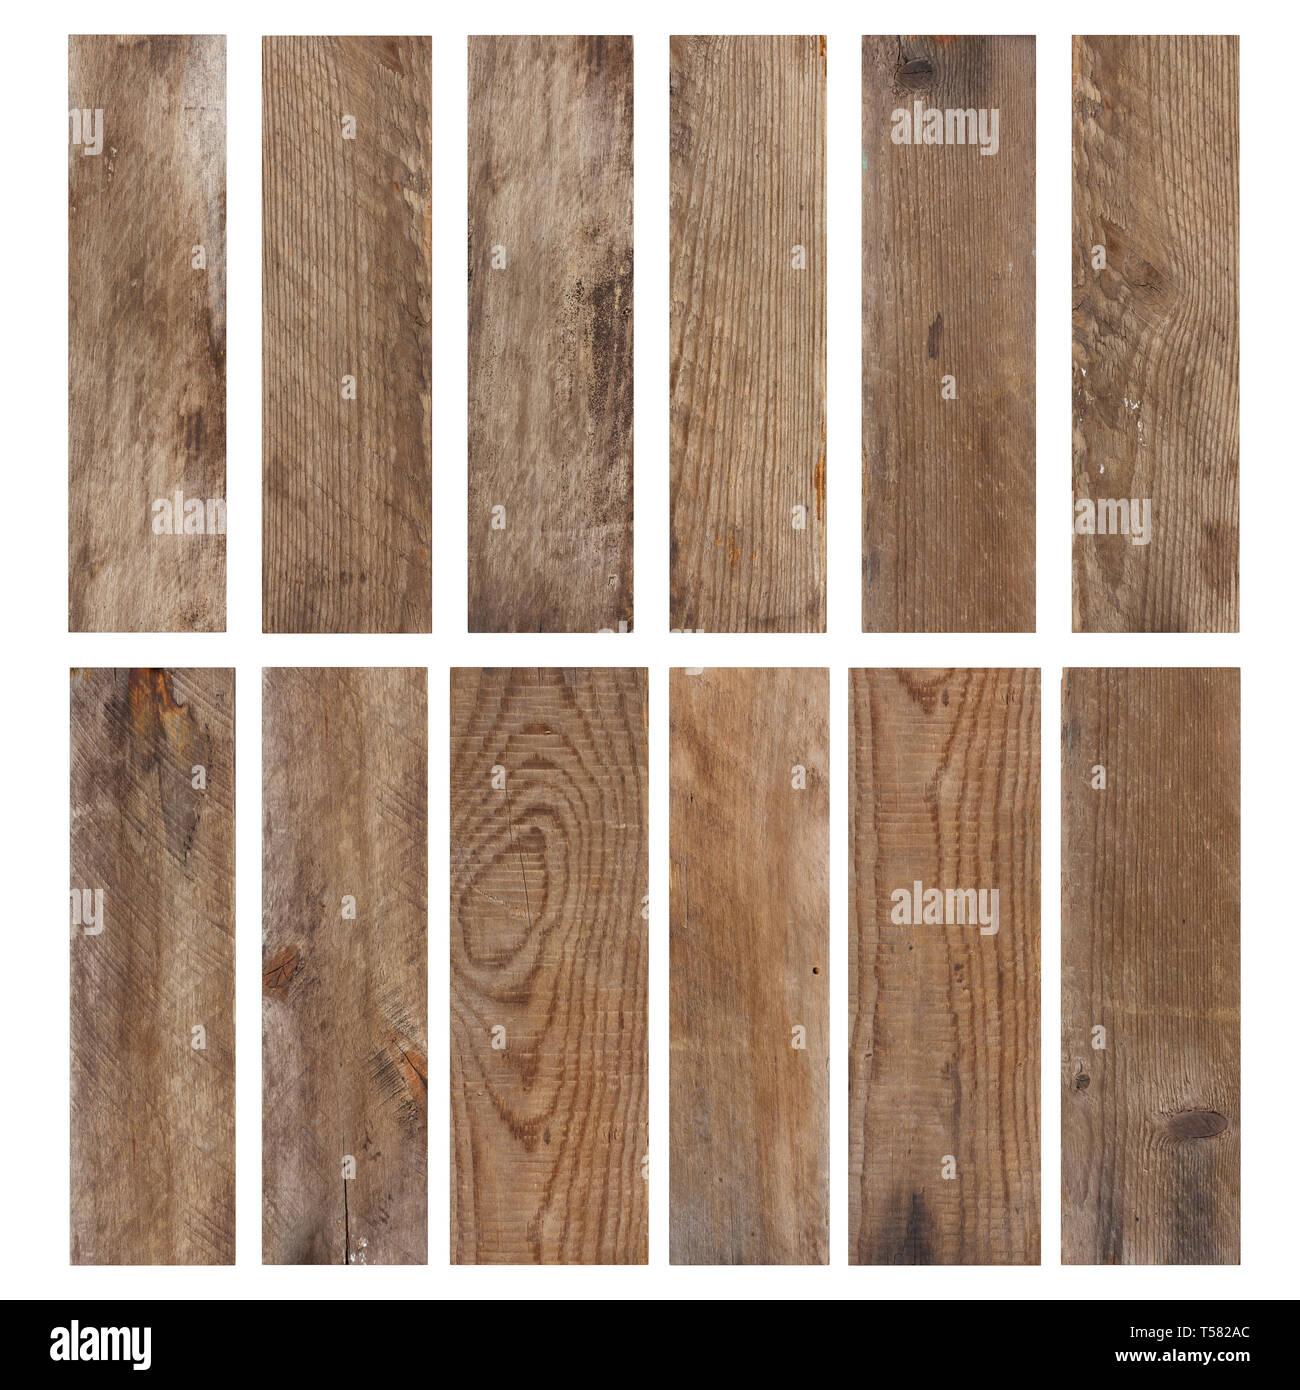 Set of vintage weathered wooden planks isolated on white background - Stock Image